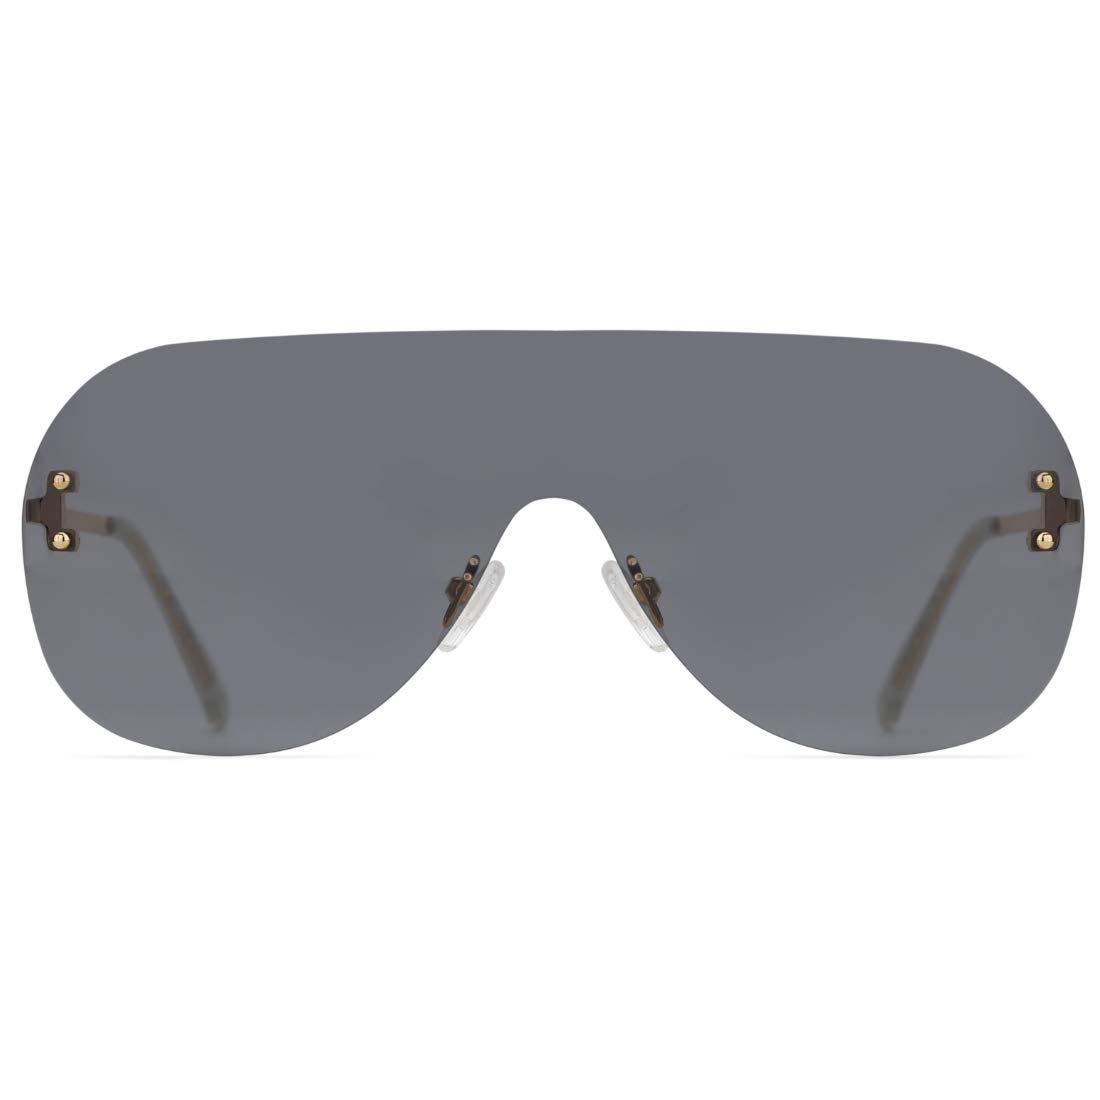 Slocyclub Vintage Round Sunglasses for Women Men Classic Retro Sun glasses UV